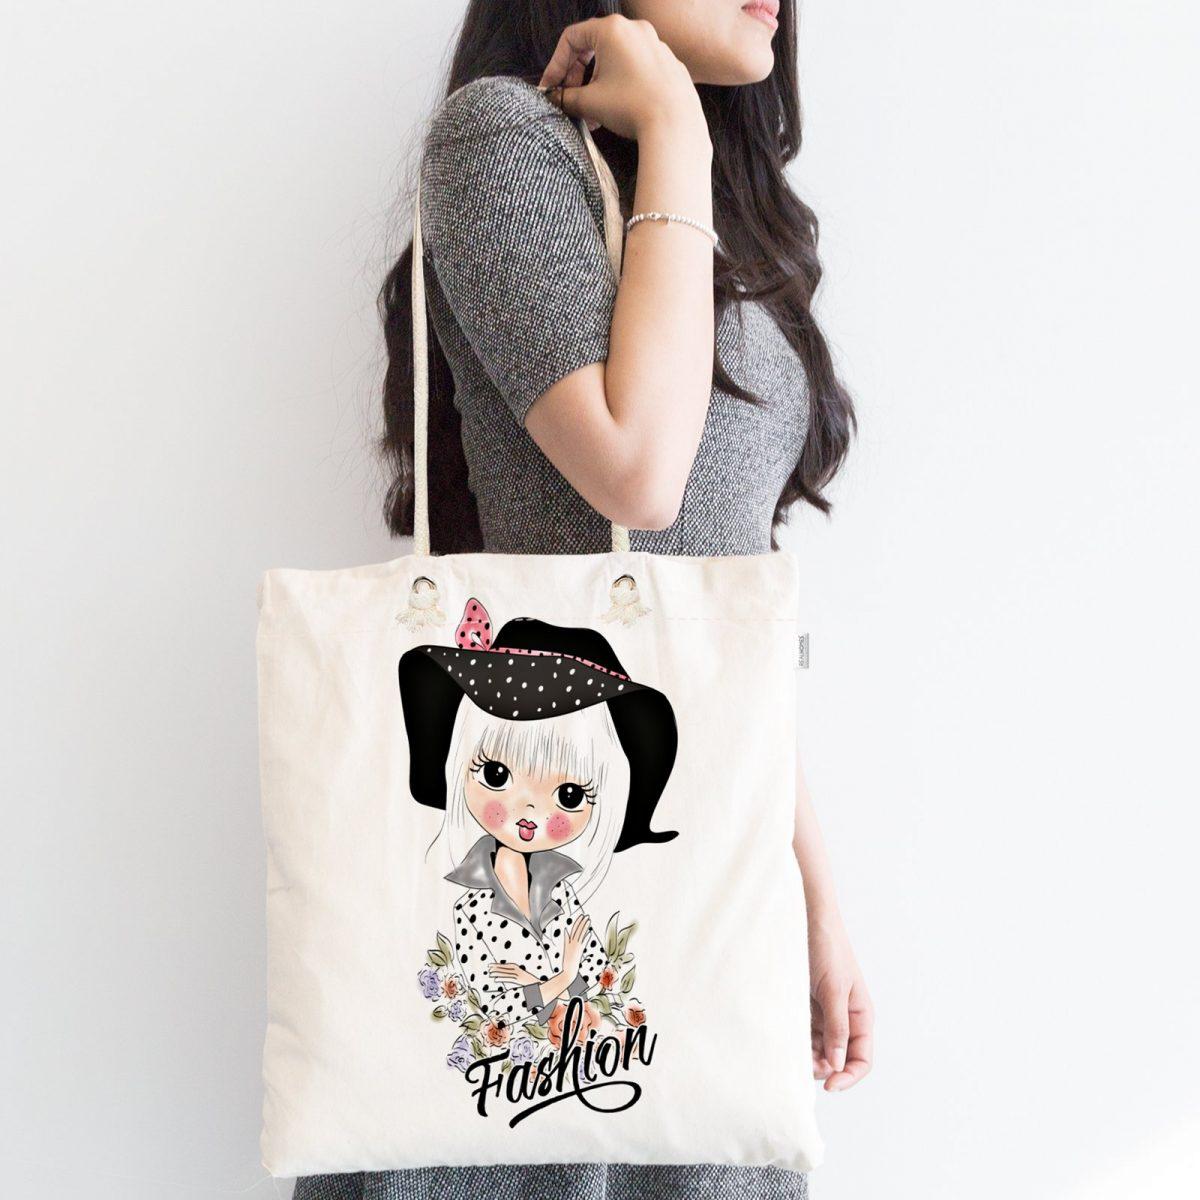 Fashion Girl Dijital Baskılı Fermuarlı Kumaş Çanta Realhomes